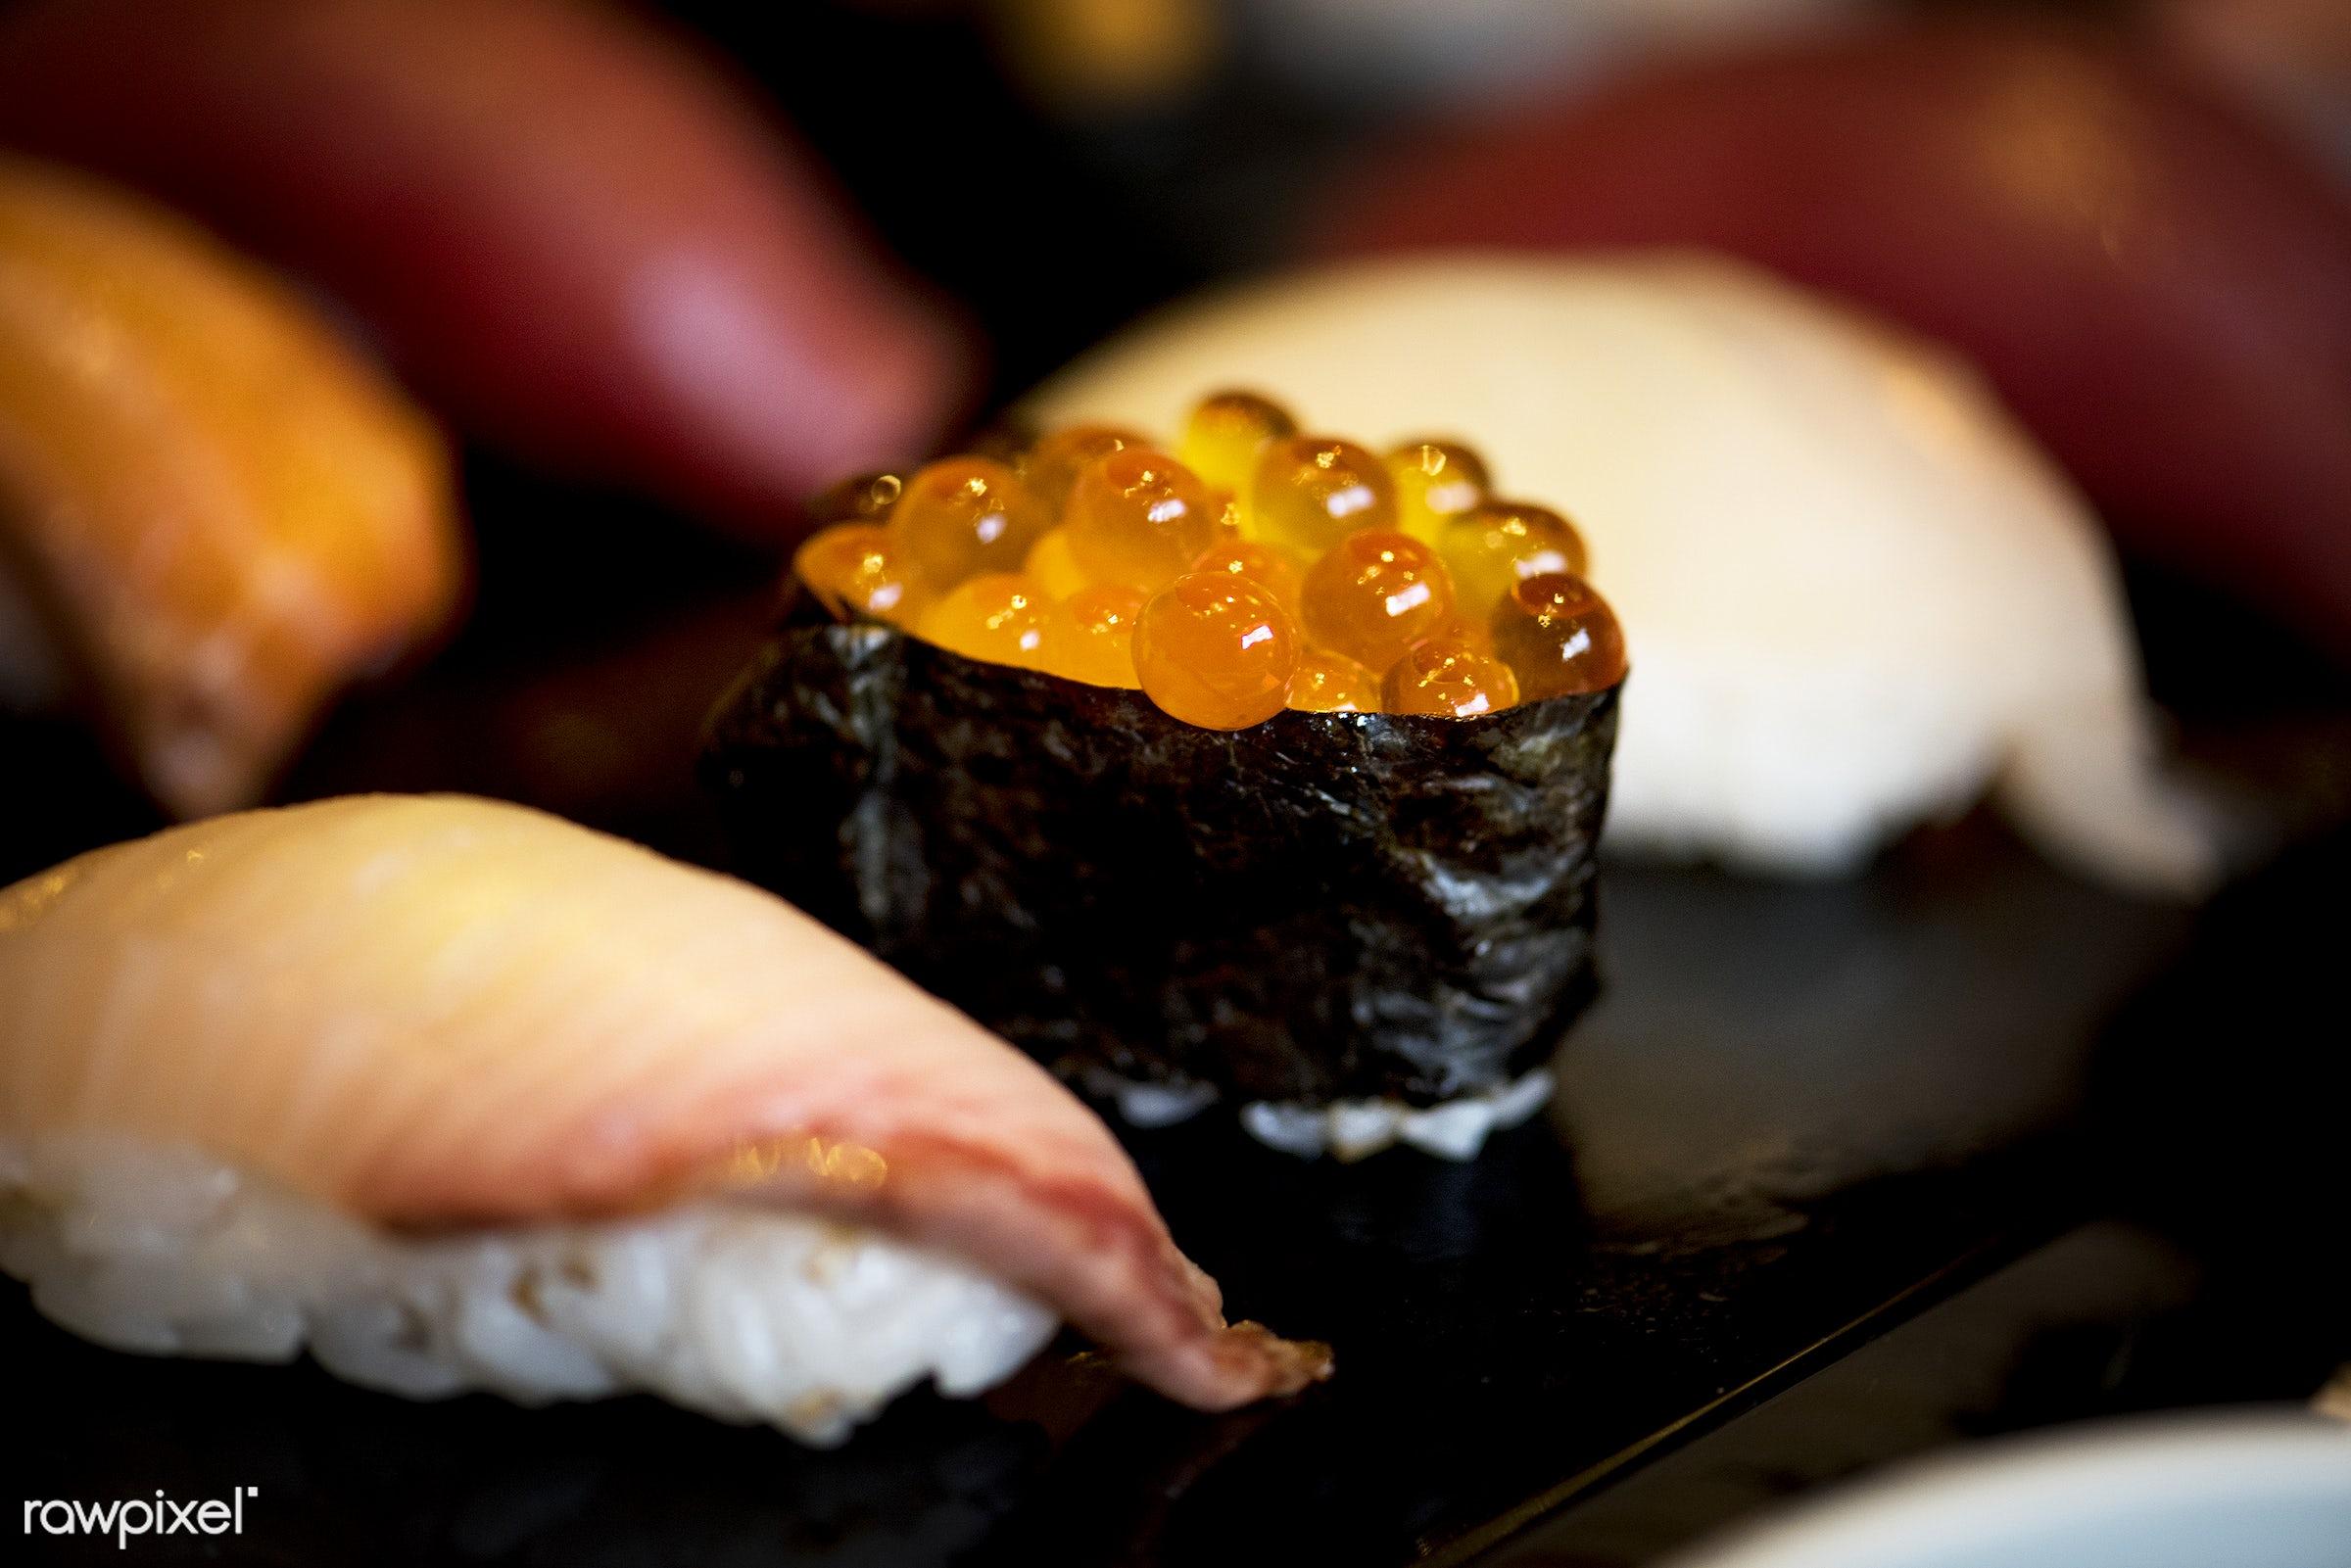 Japanese cuisine - sushi, tasty, asia, asian, cuisine, delicious, eating, fish, food, fresh, gourmet, healthy, ikura, japan...